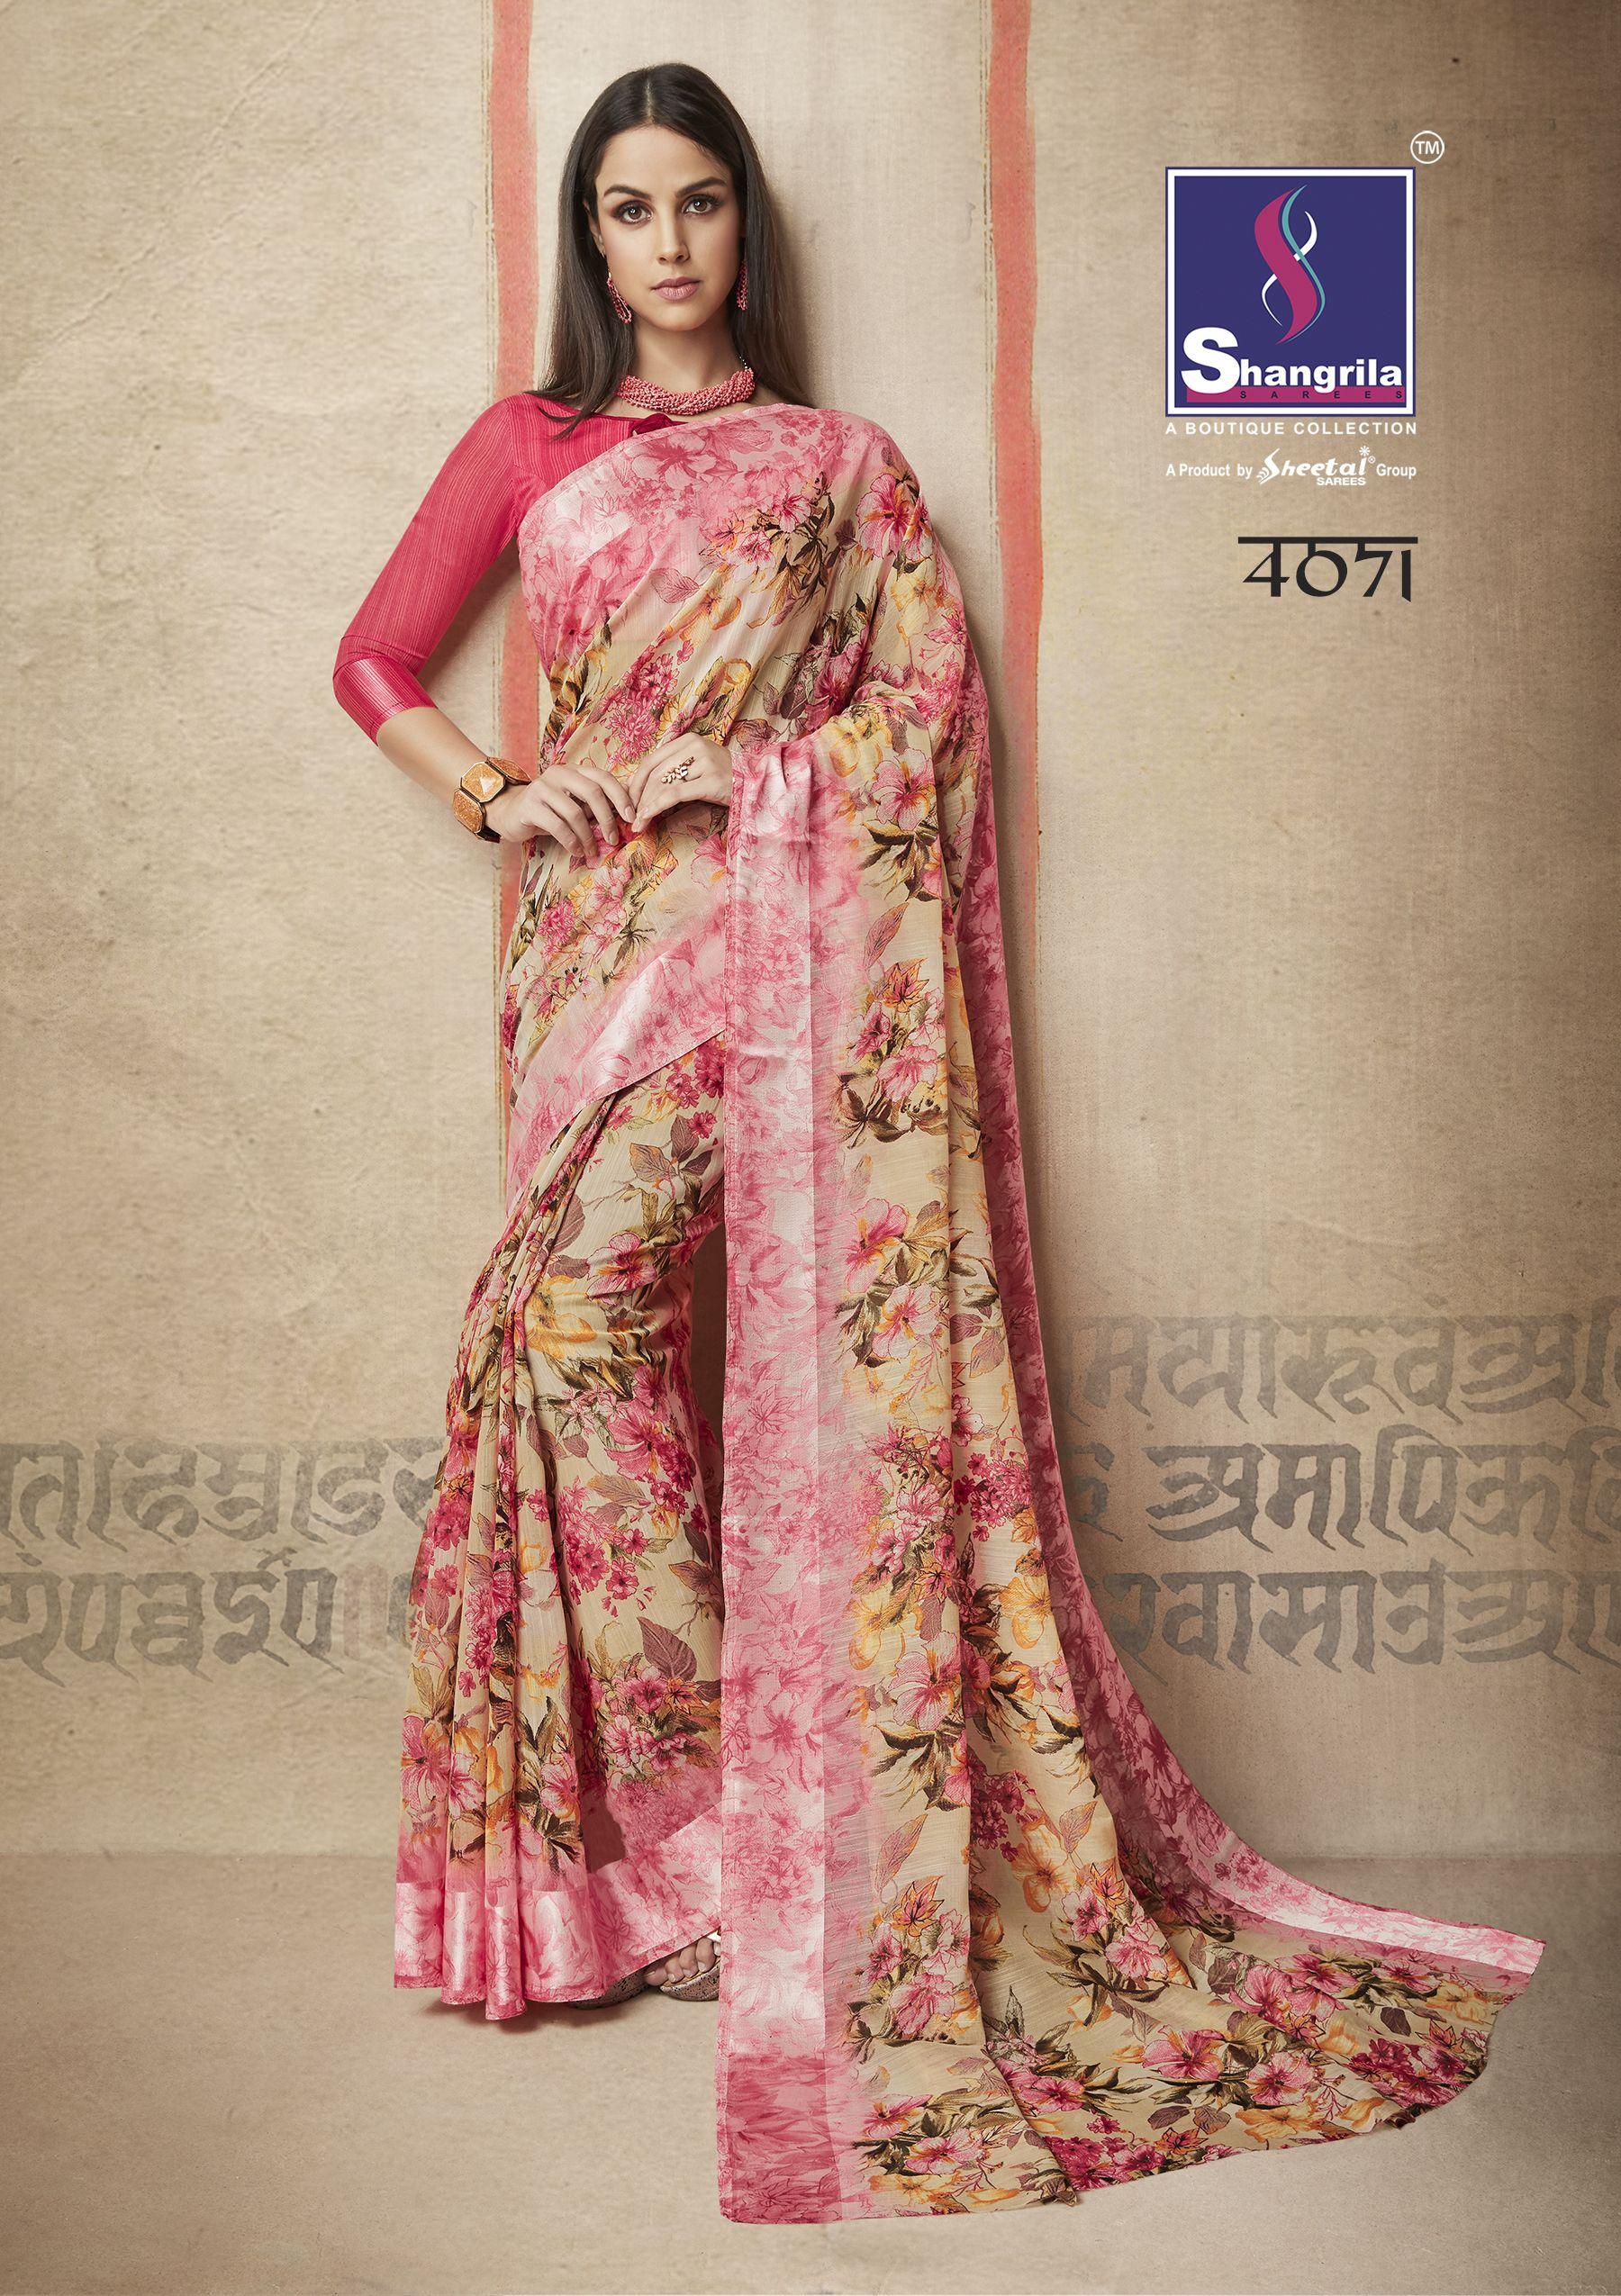 Shangrila Kanchana Vol-6 Linen Cotton Saree (12 pc catalog ... 33832e34c37